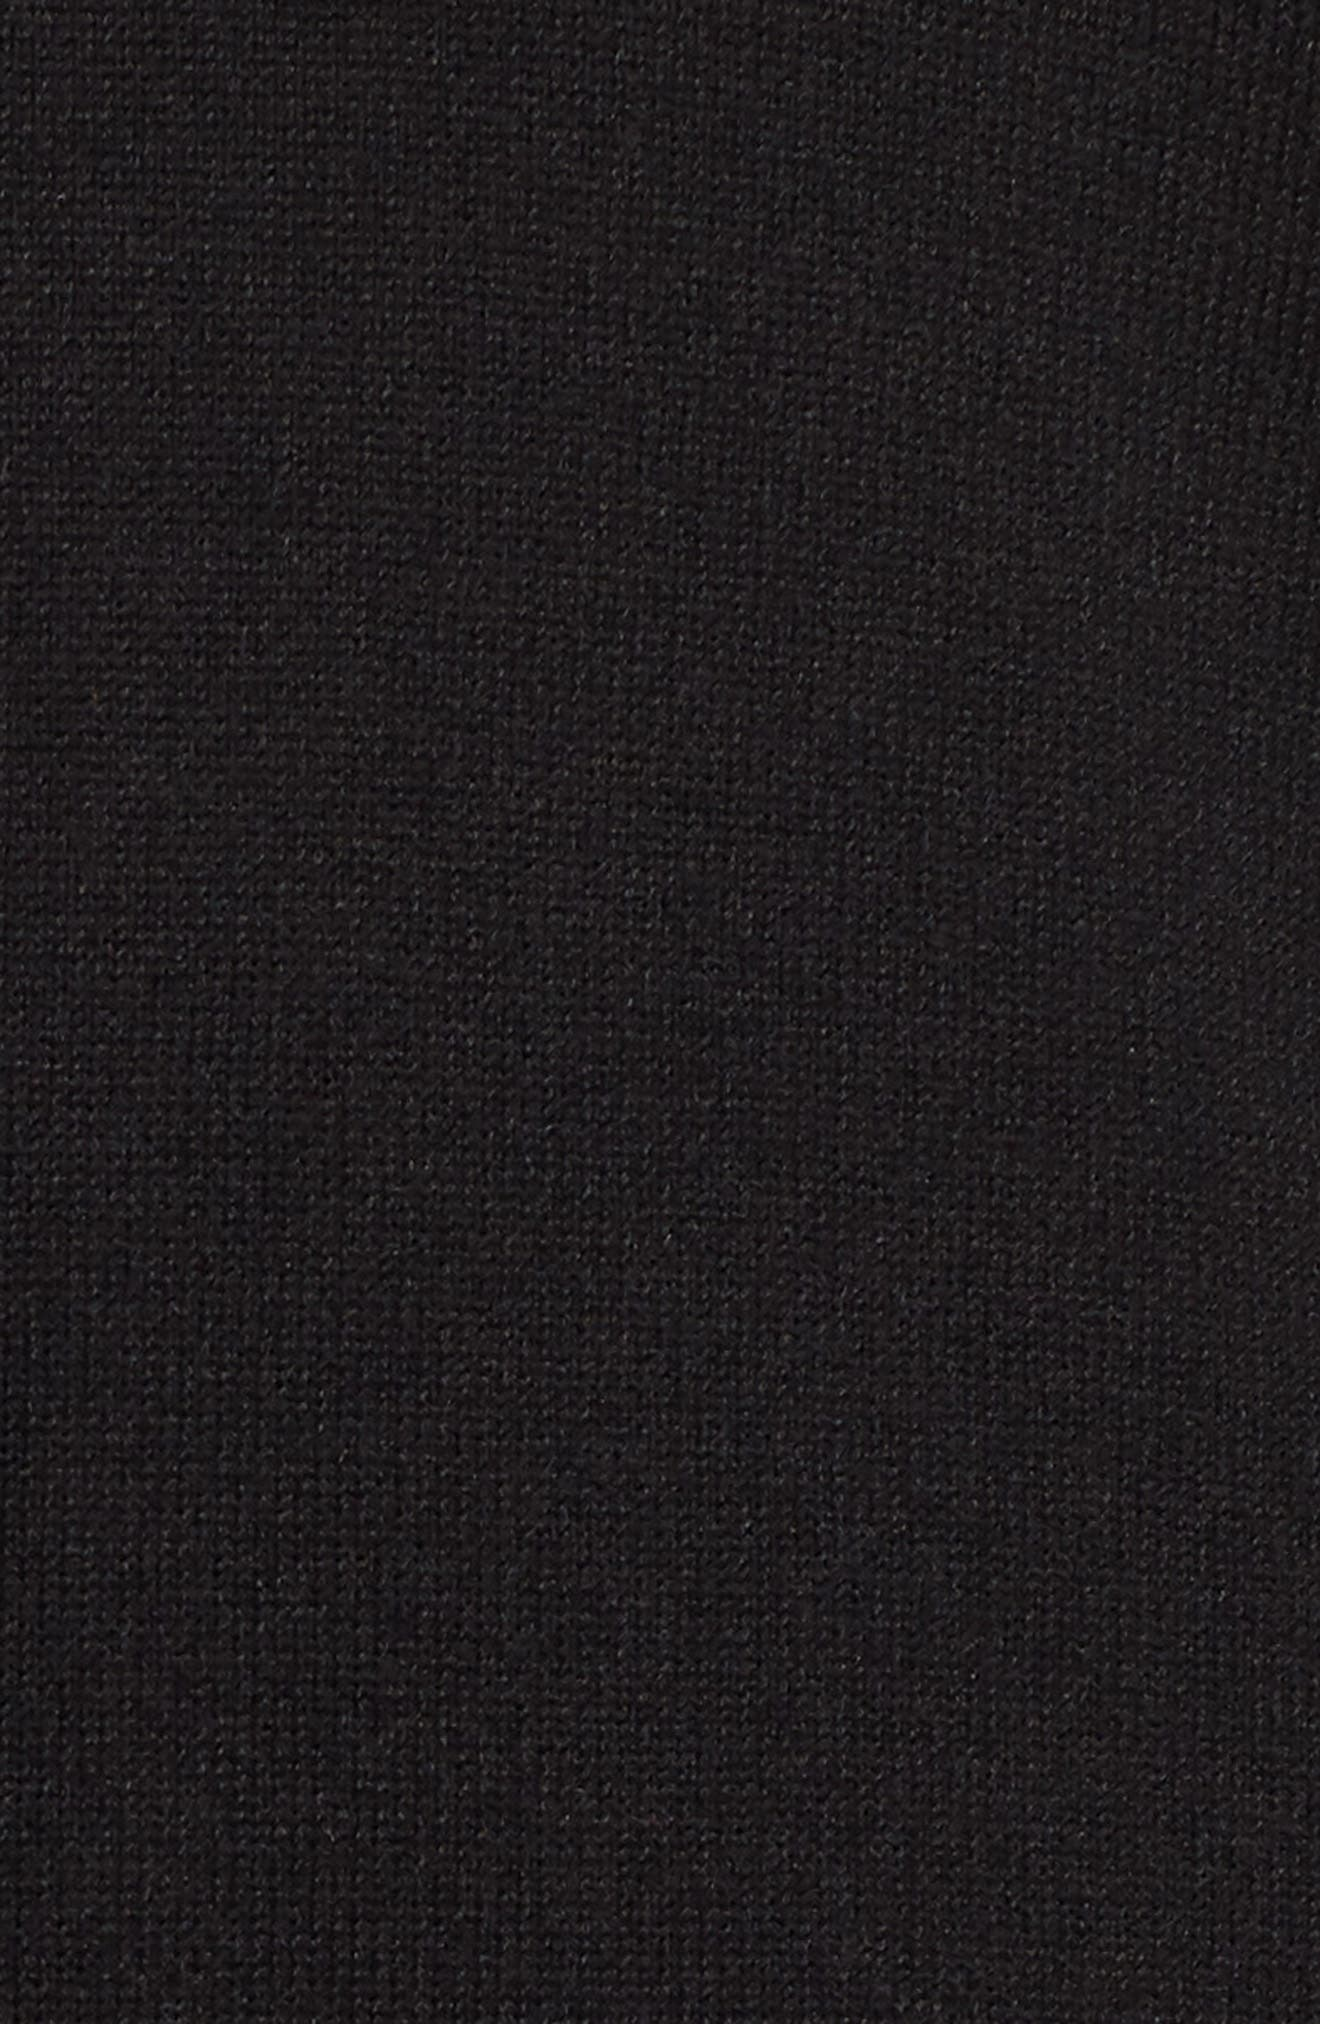 Side Slit Sweater,                             Alternate thumbnail 6, color,                             001